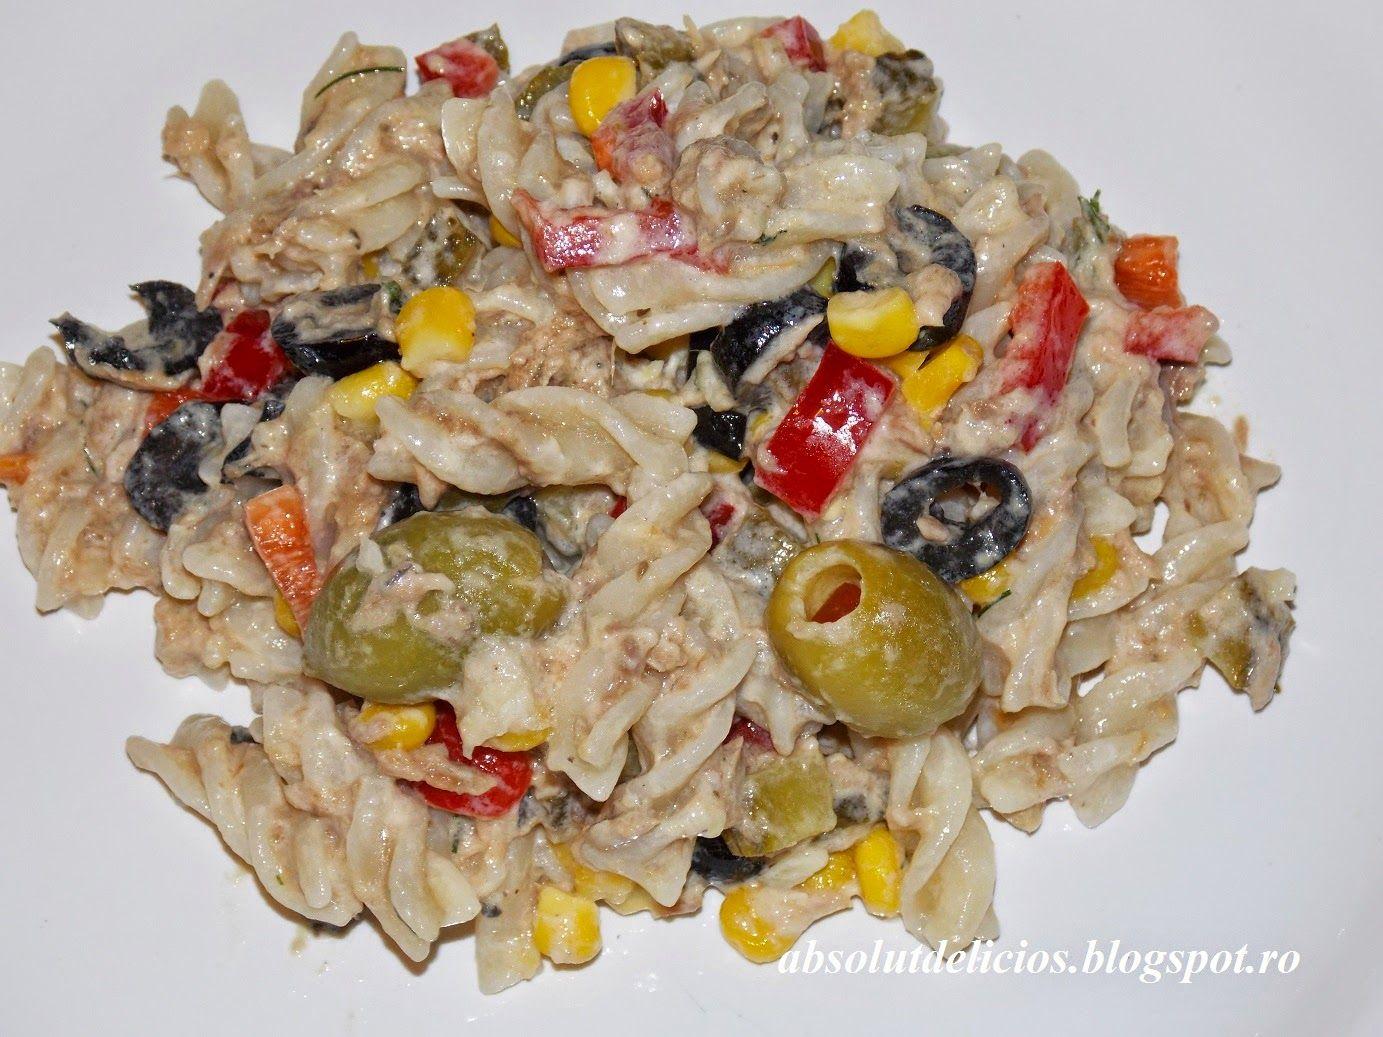 Salate simple de sarbatori